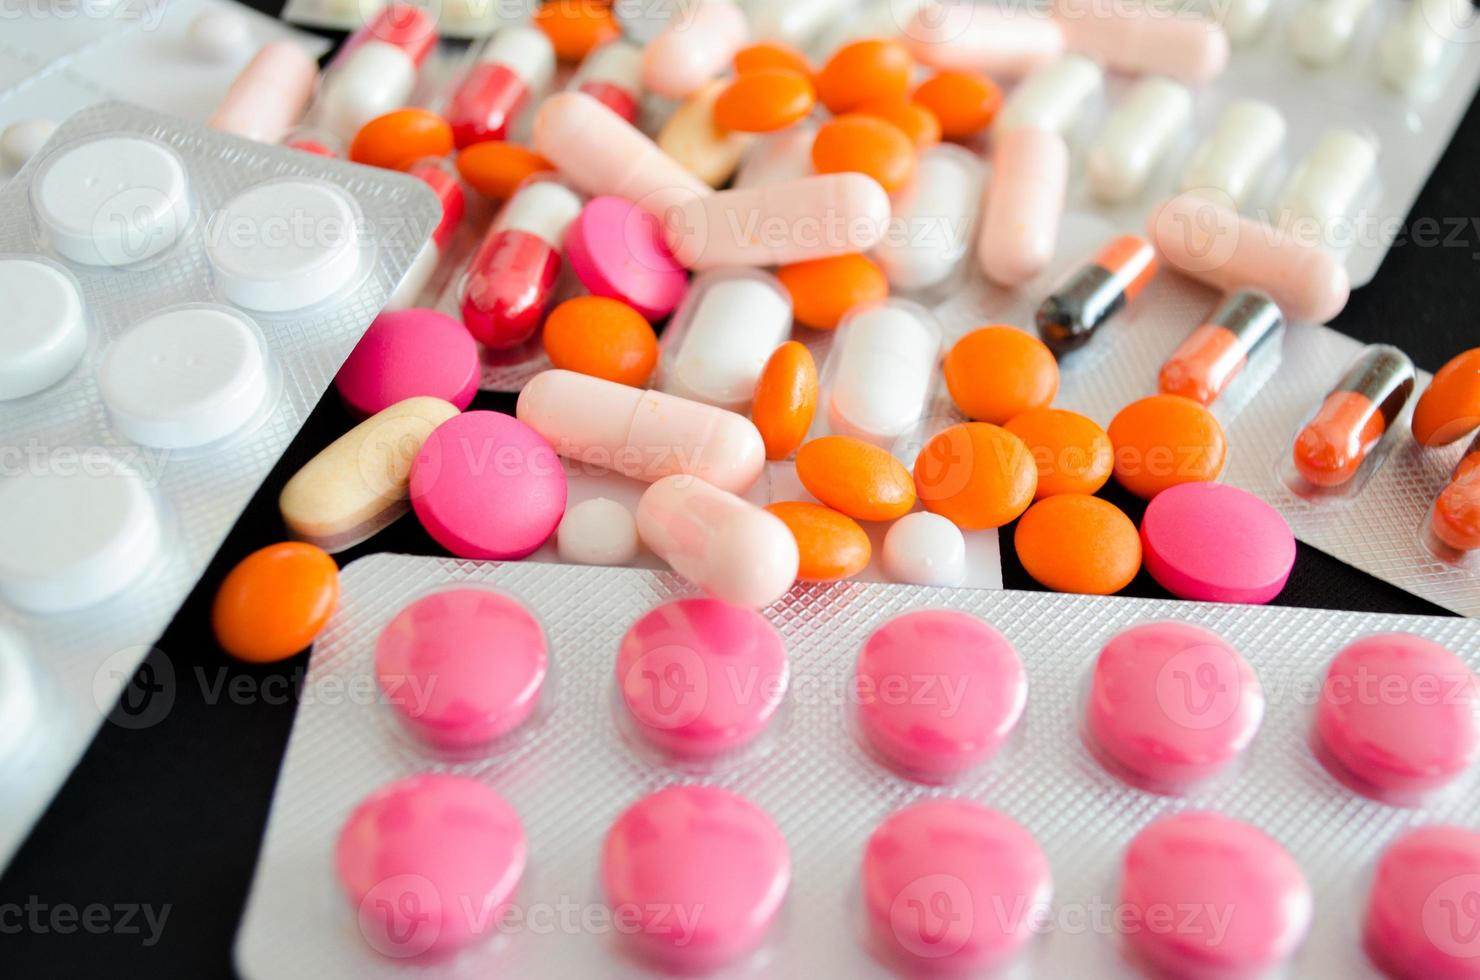 pílulas de close-up foto